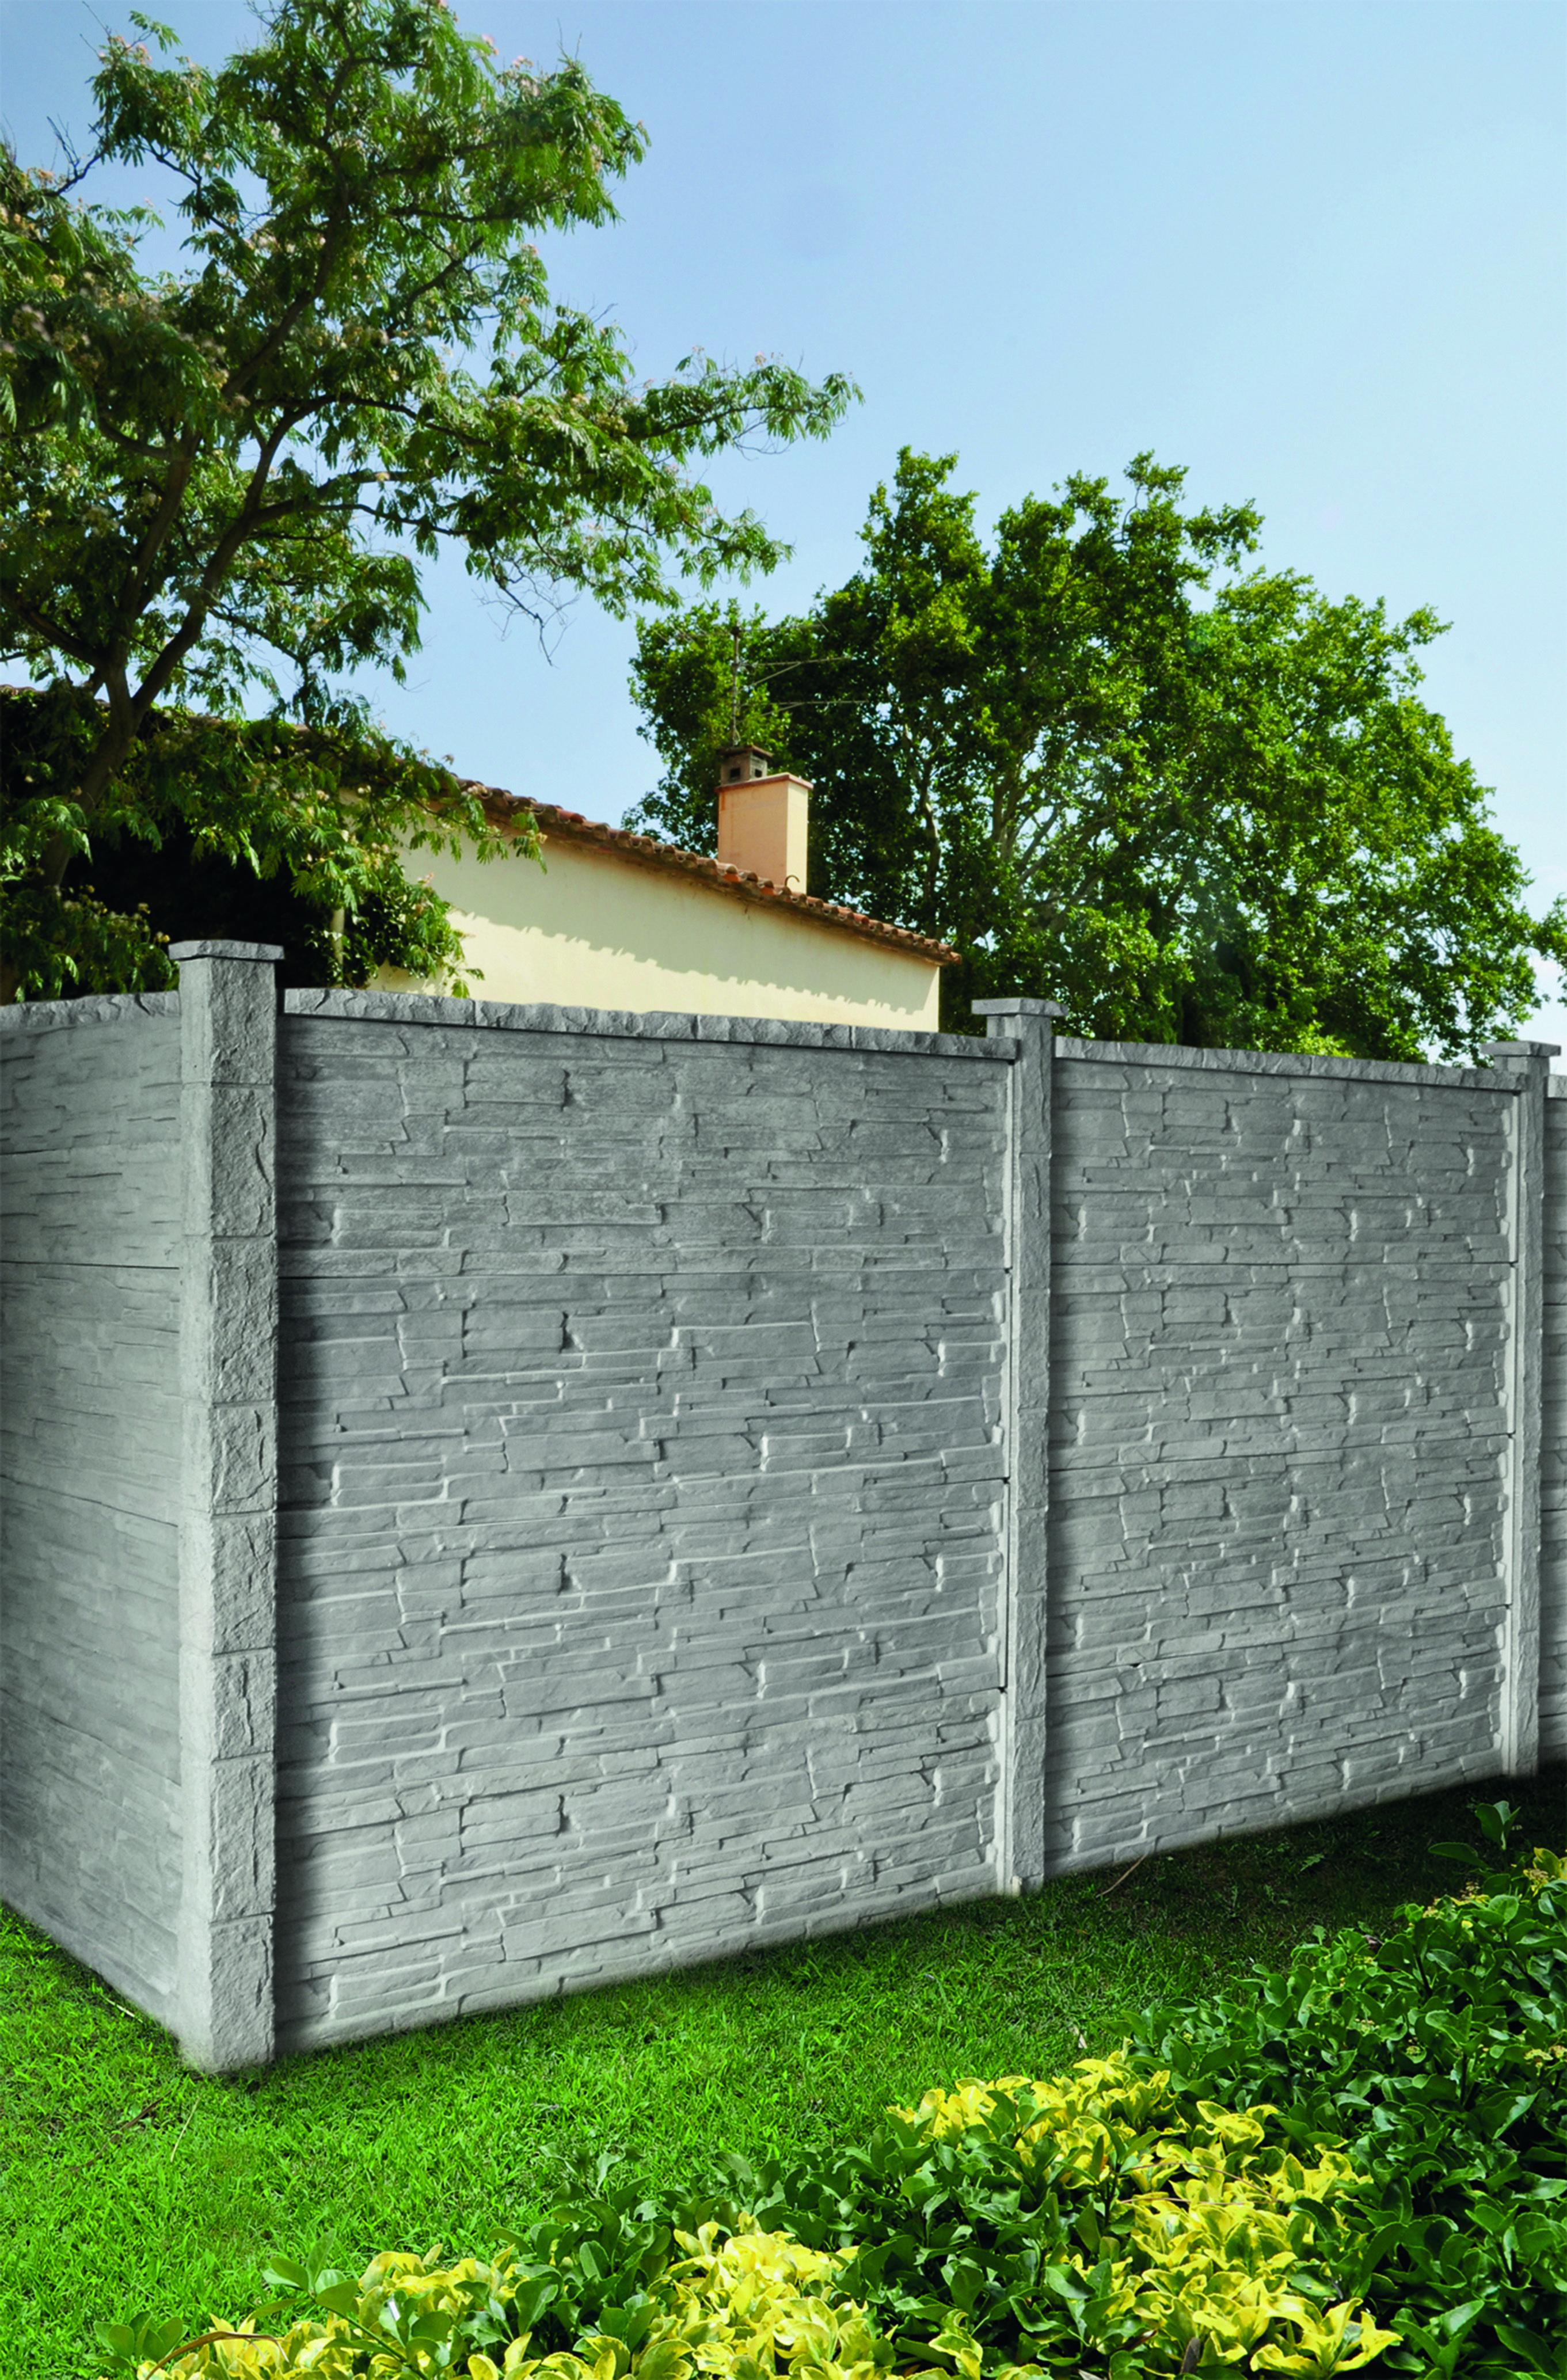 terrasseBild von Saman Modheji in 2020